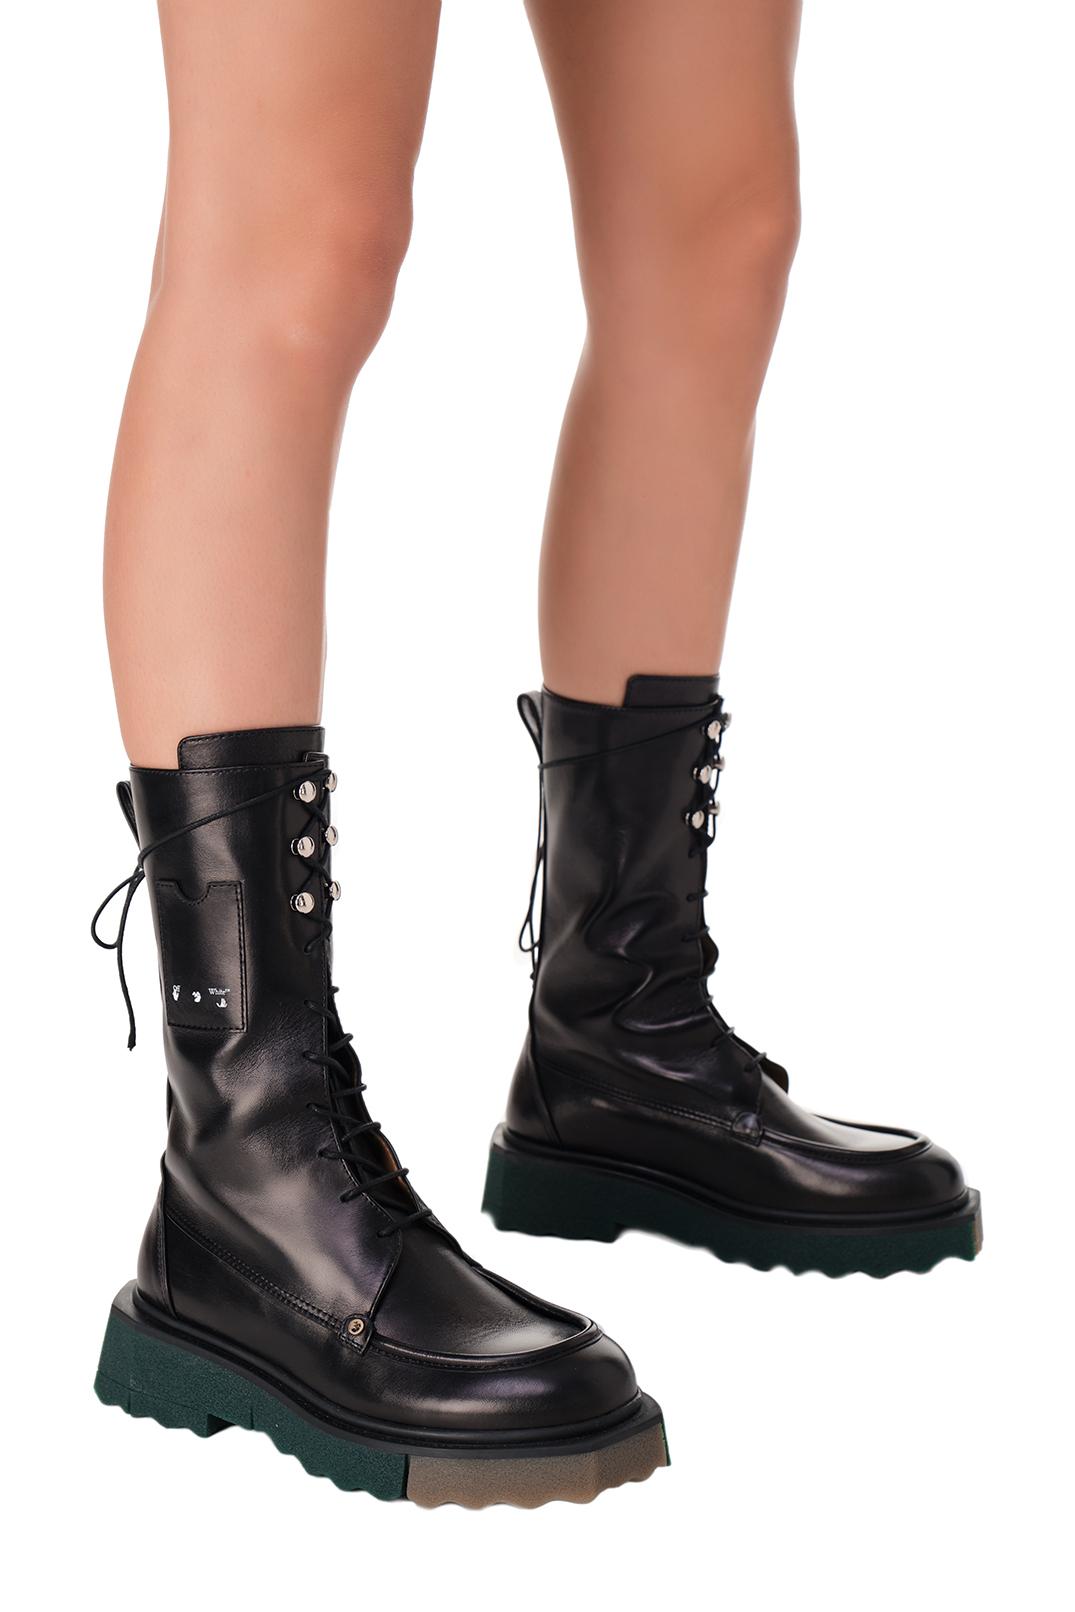 Ботинки COMBAT OFF-WHITE OWa11004